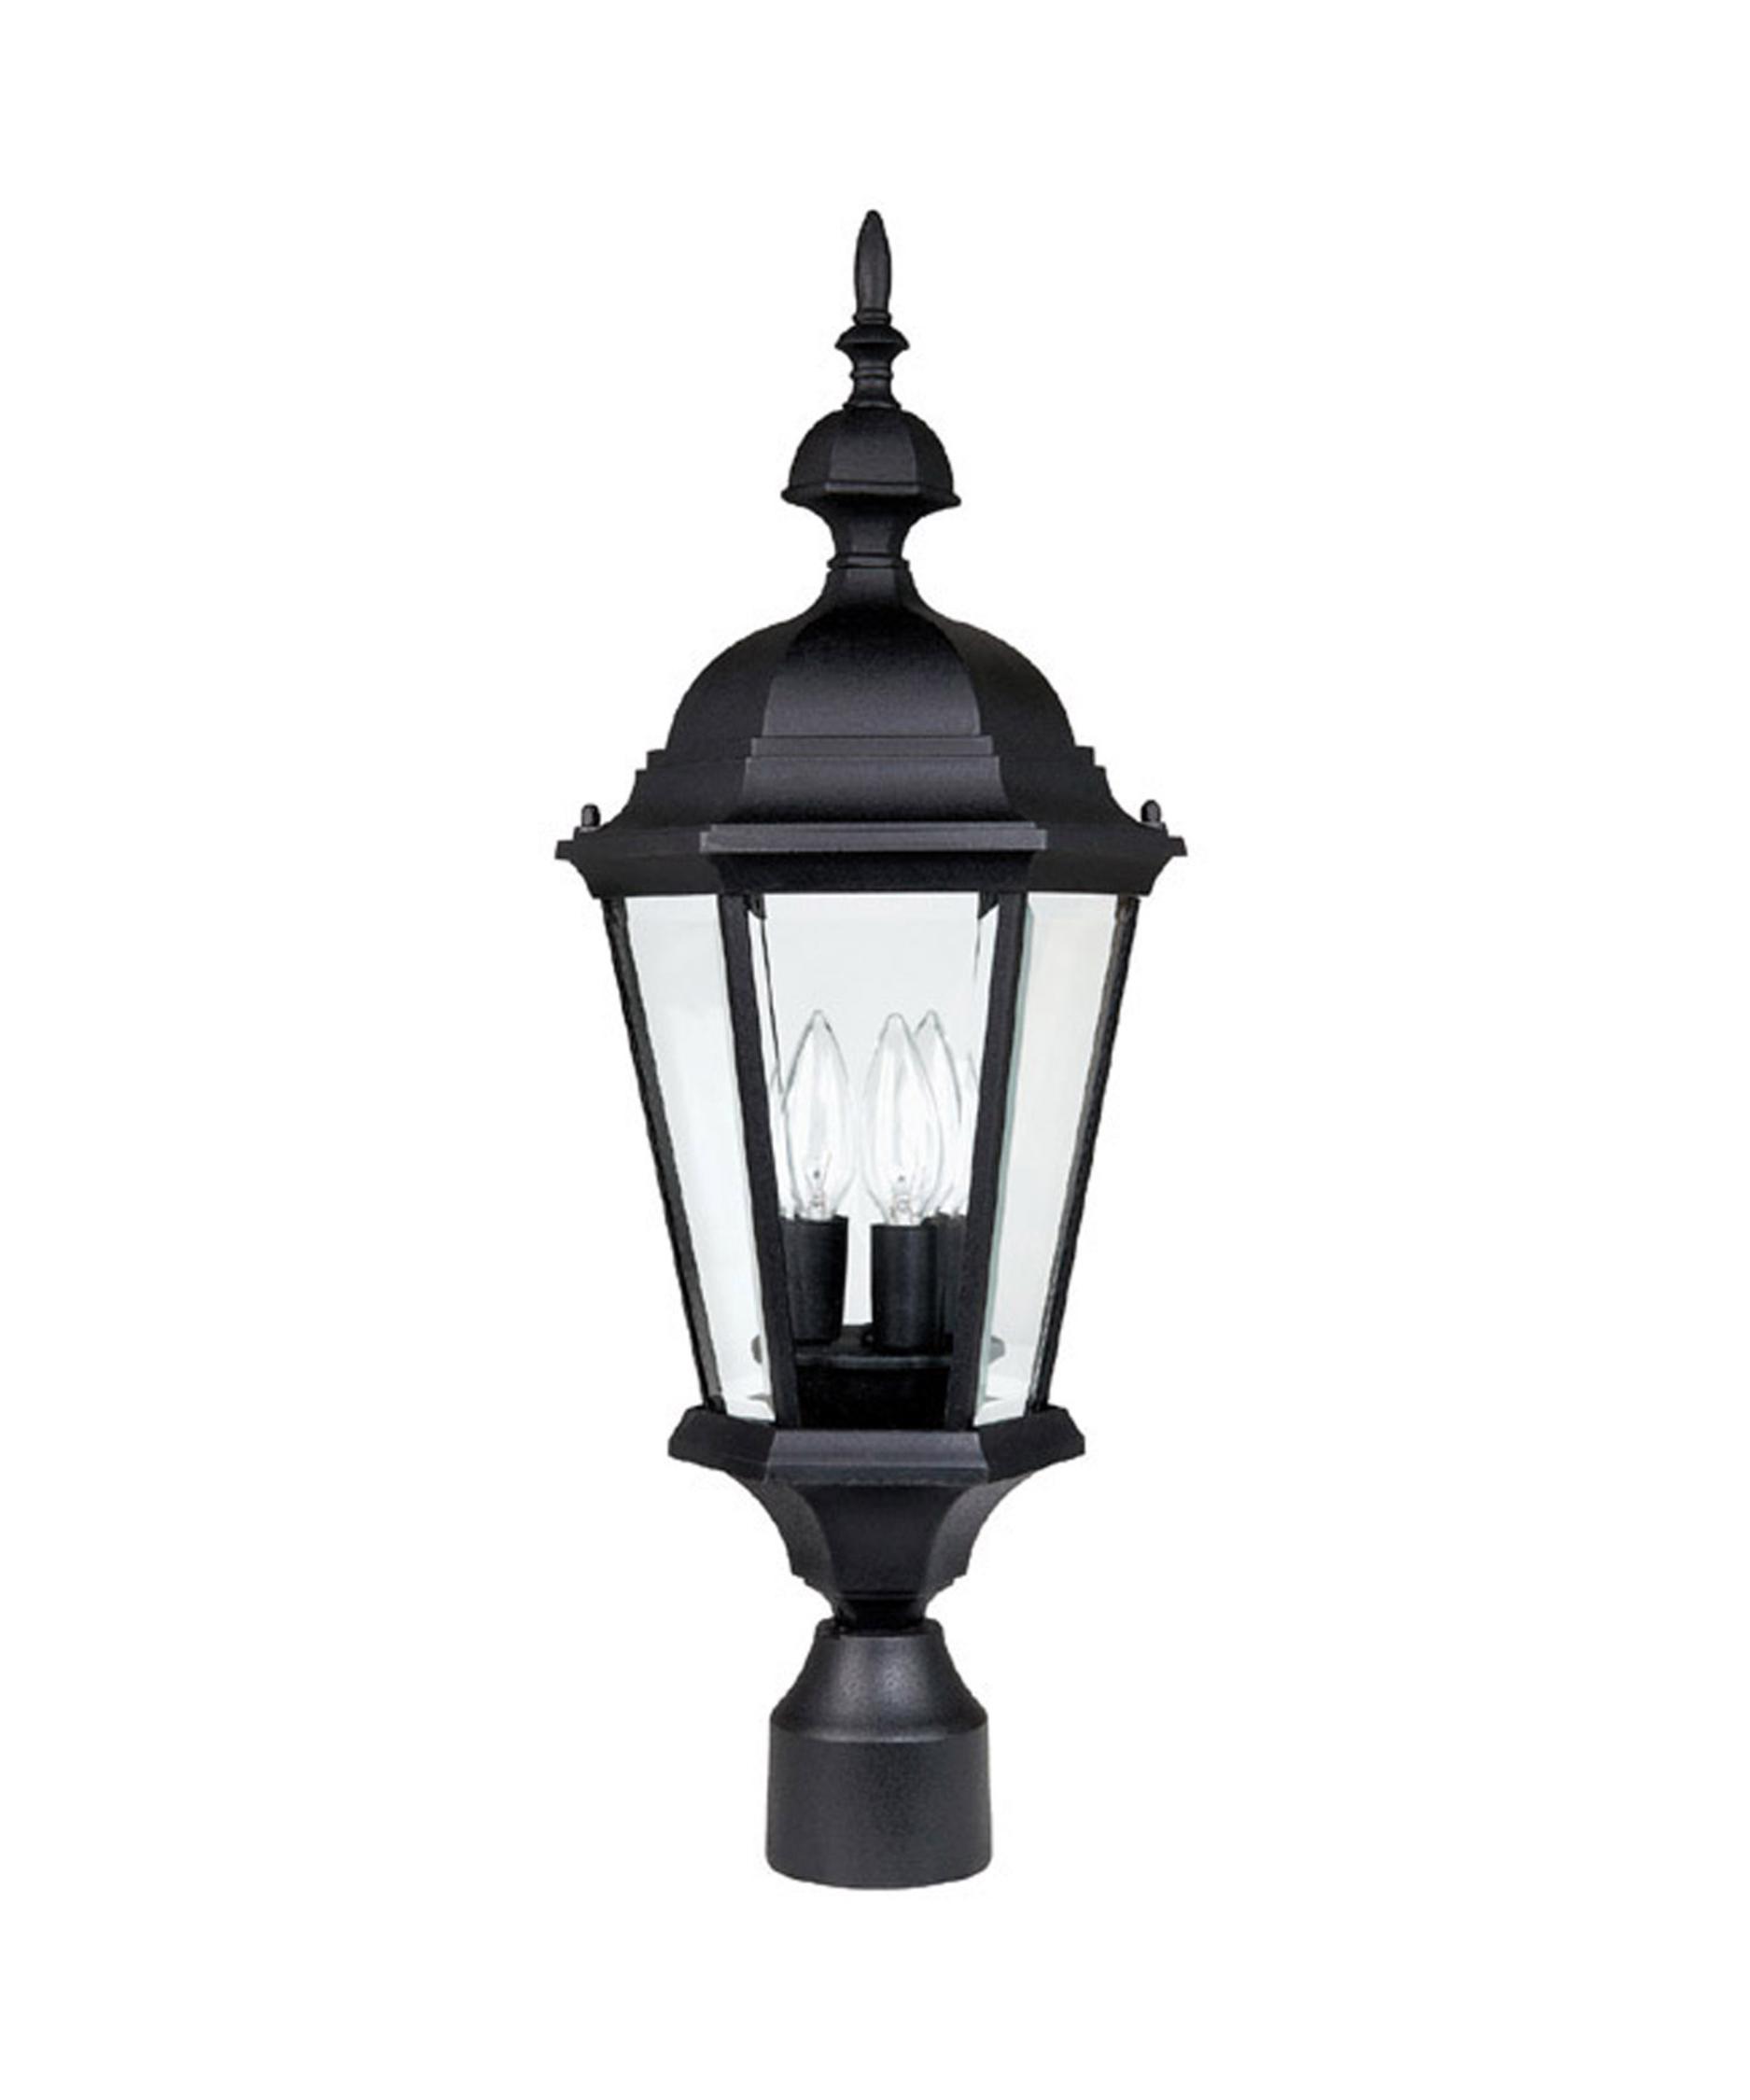 Capital lighting 9725 carriage house 3 light outdoor post lamp capitol lighting 1 for Carriage house exterior lights